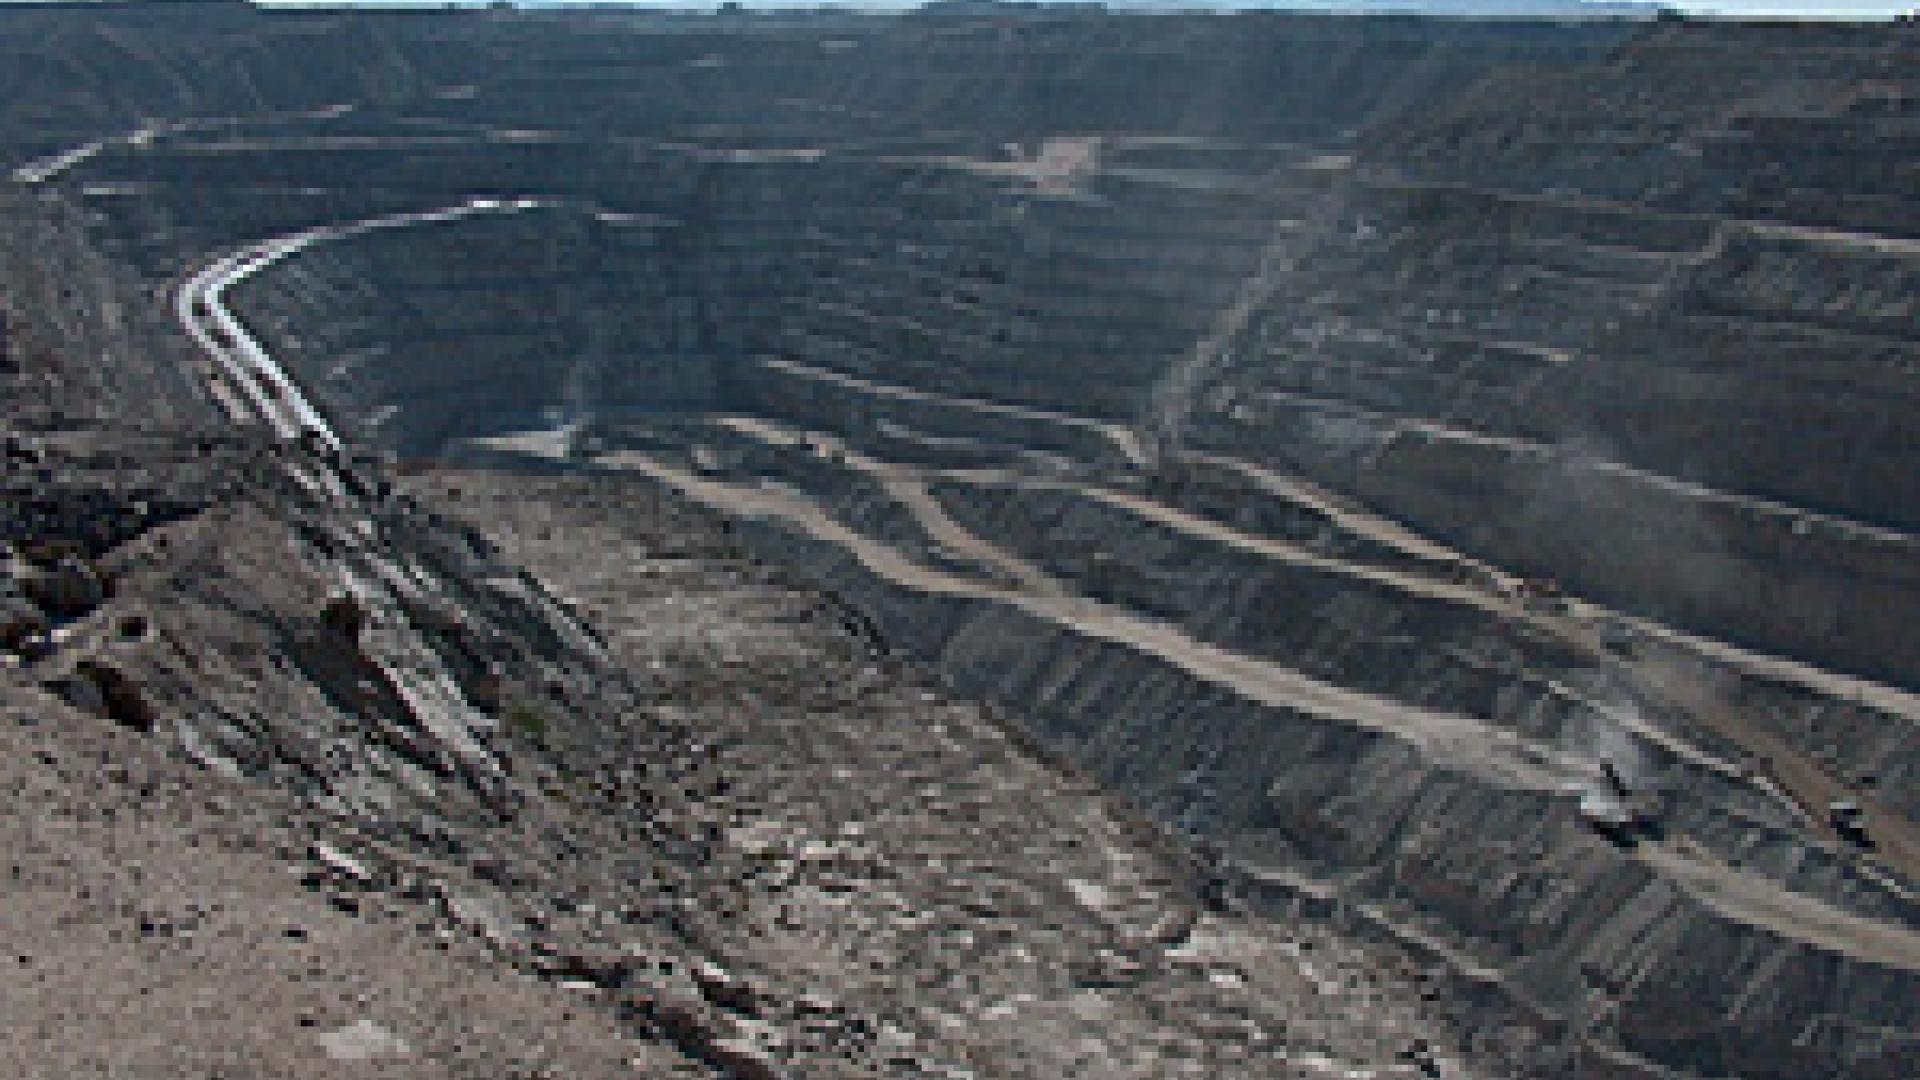 Modern uranium mining iaea - Mining images hd ...